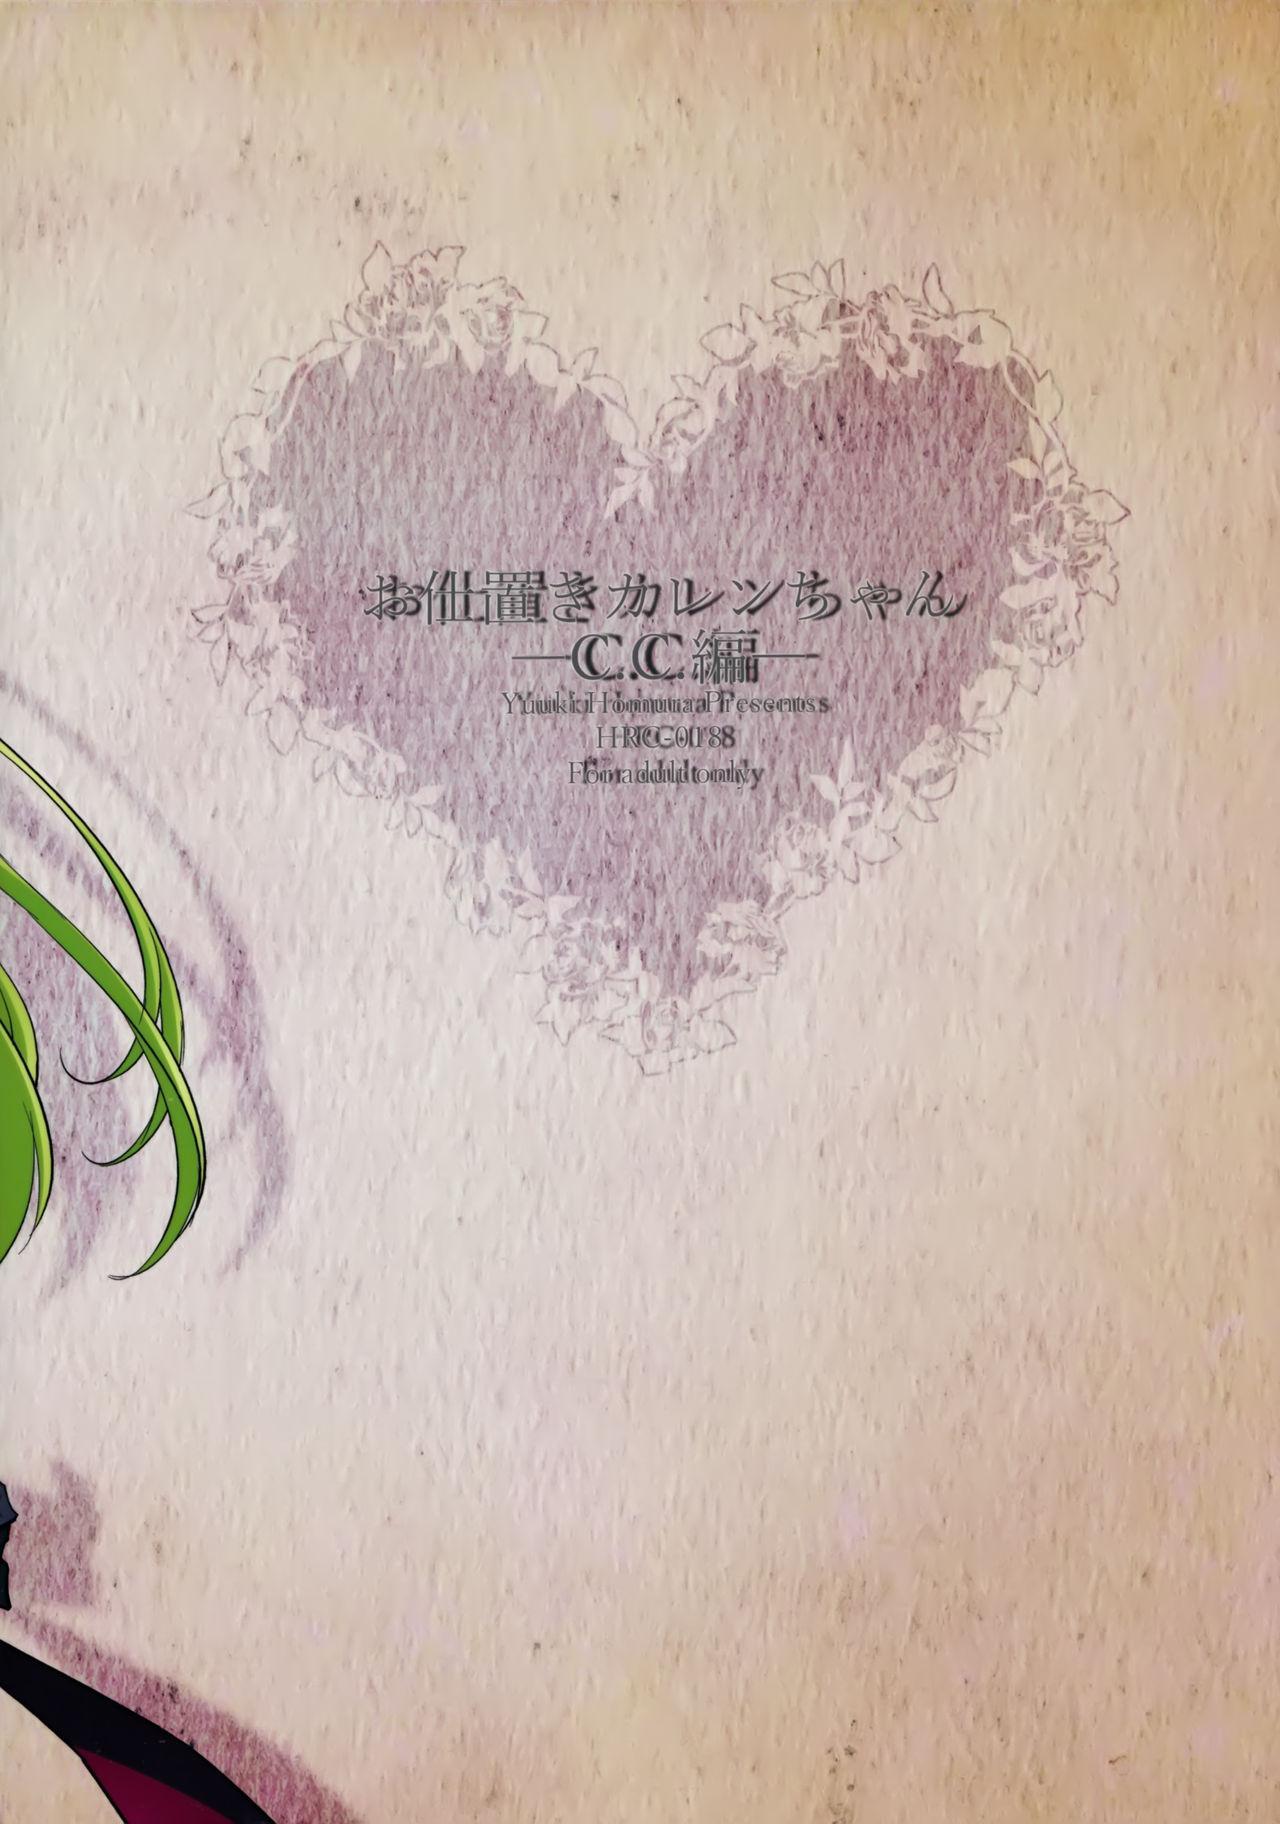 (C90) [Homura's R Comics (Yuuki Homura)] Oshioki Kallen-chan -C.C. Hen- (Code Geass) 21